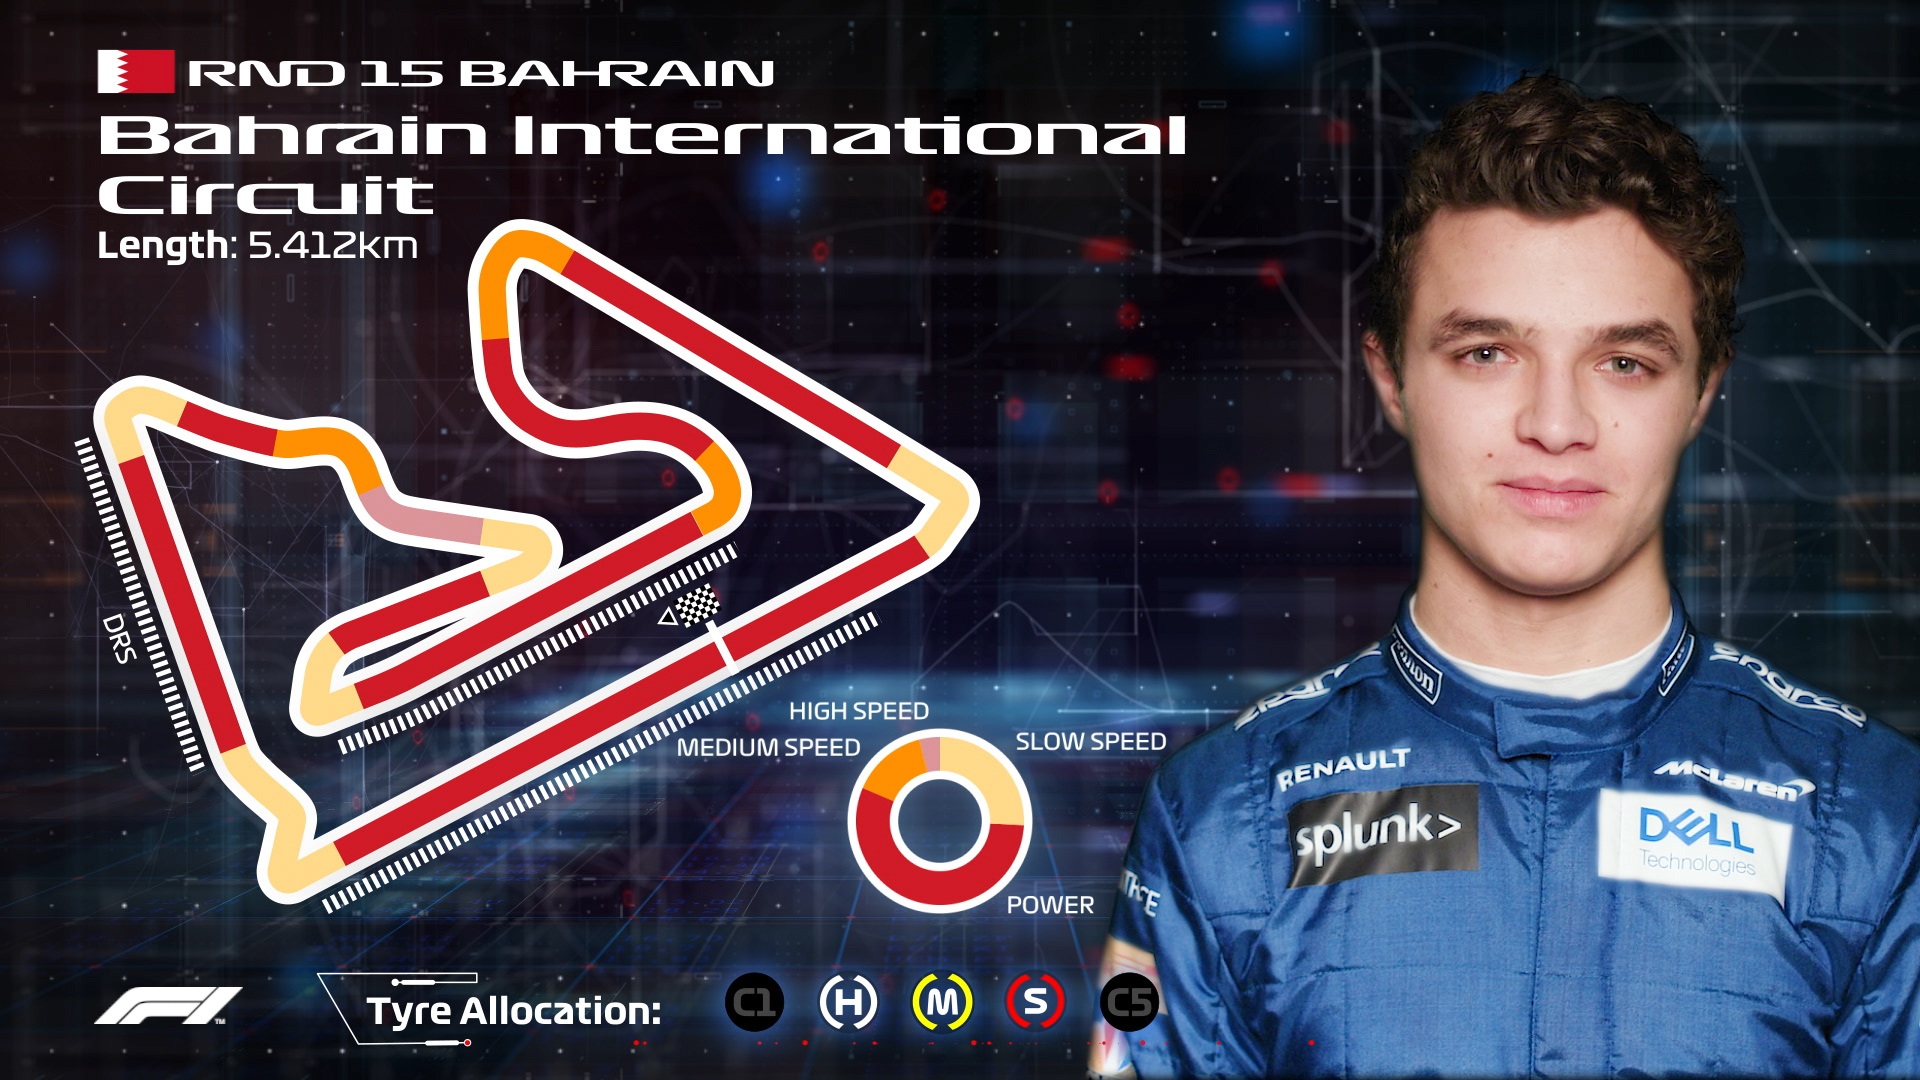 Bahrain: Lando Norris's Bahrain International Circuit guide